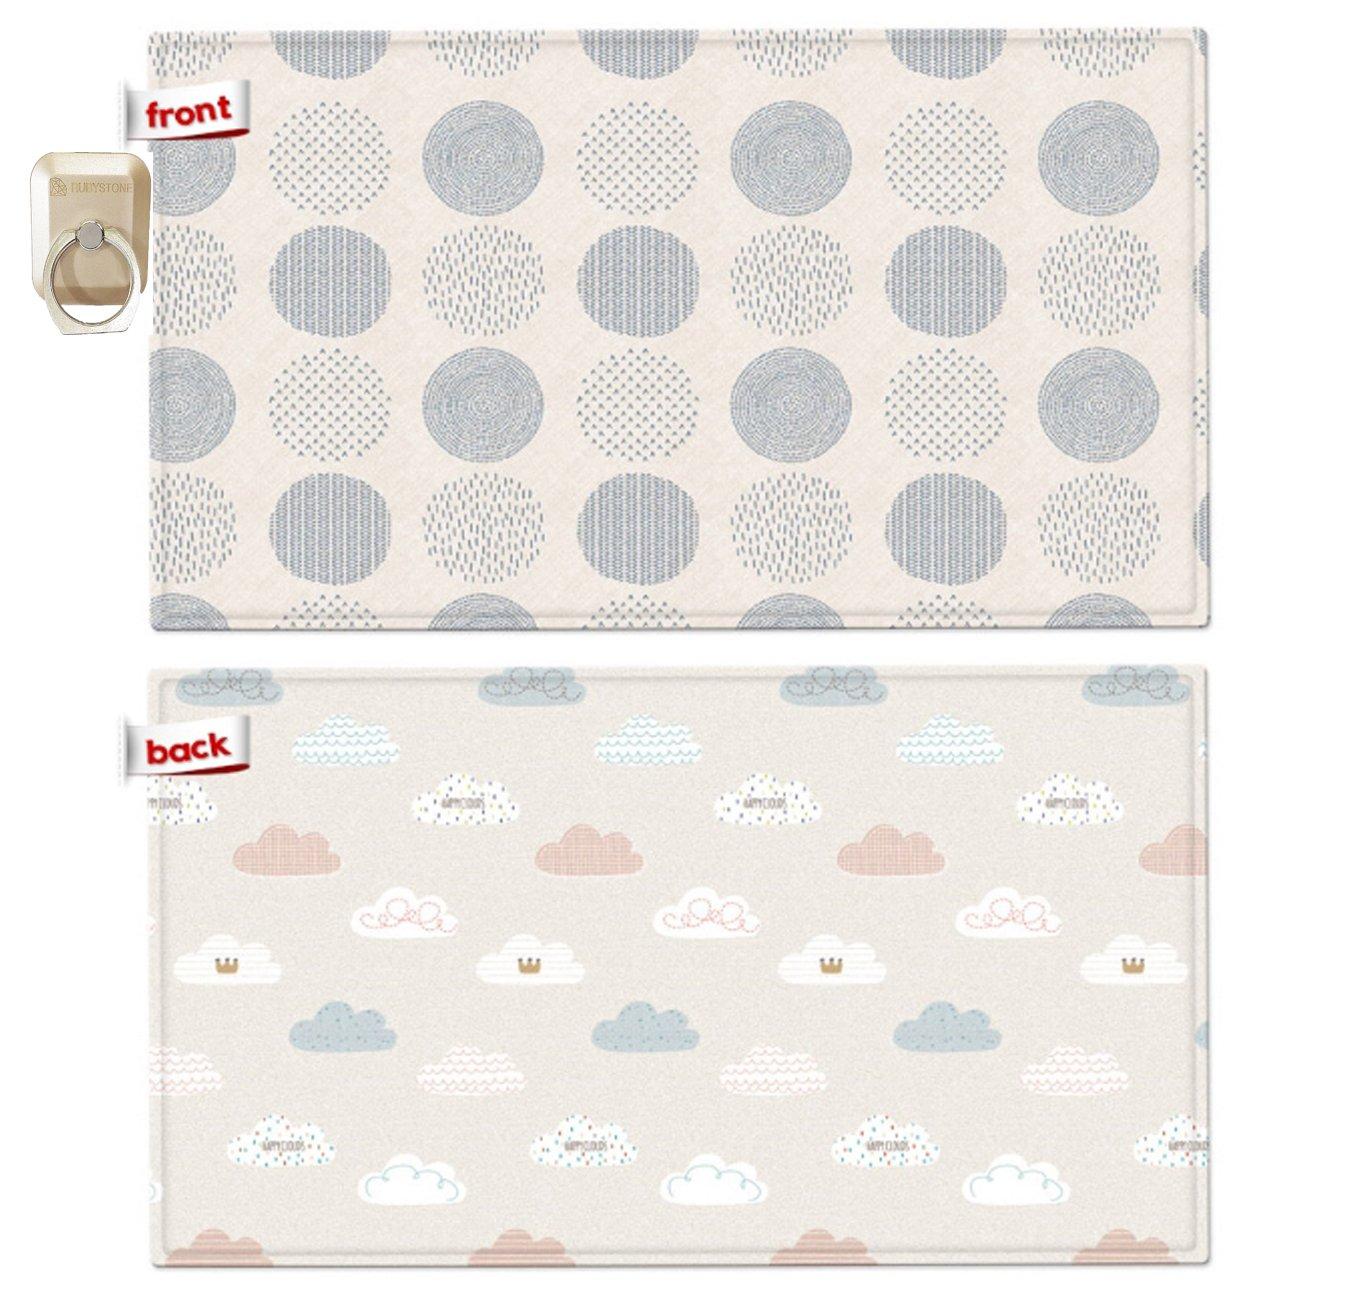 Parklon Pure Soft Play Mat190*130*1.2cm環境安全ベビープレイマット赤ちゃんマット(海外直送)   B06XVLTG4W